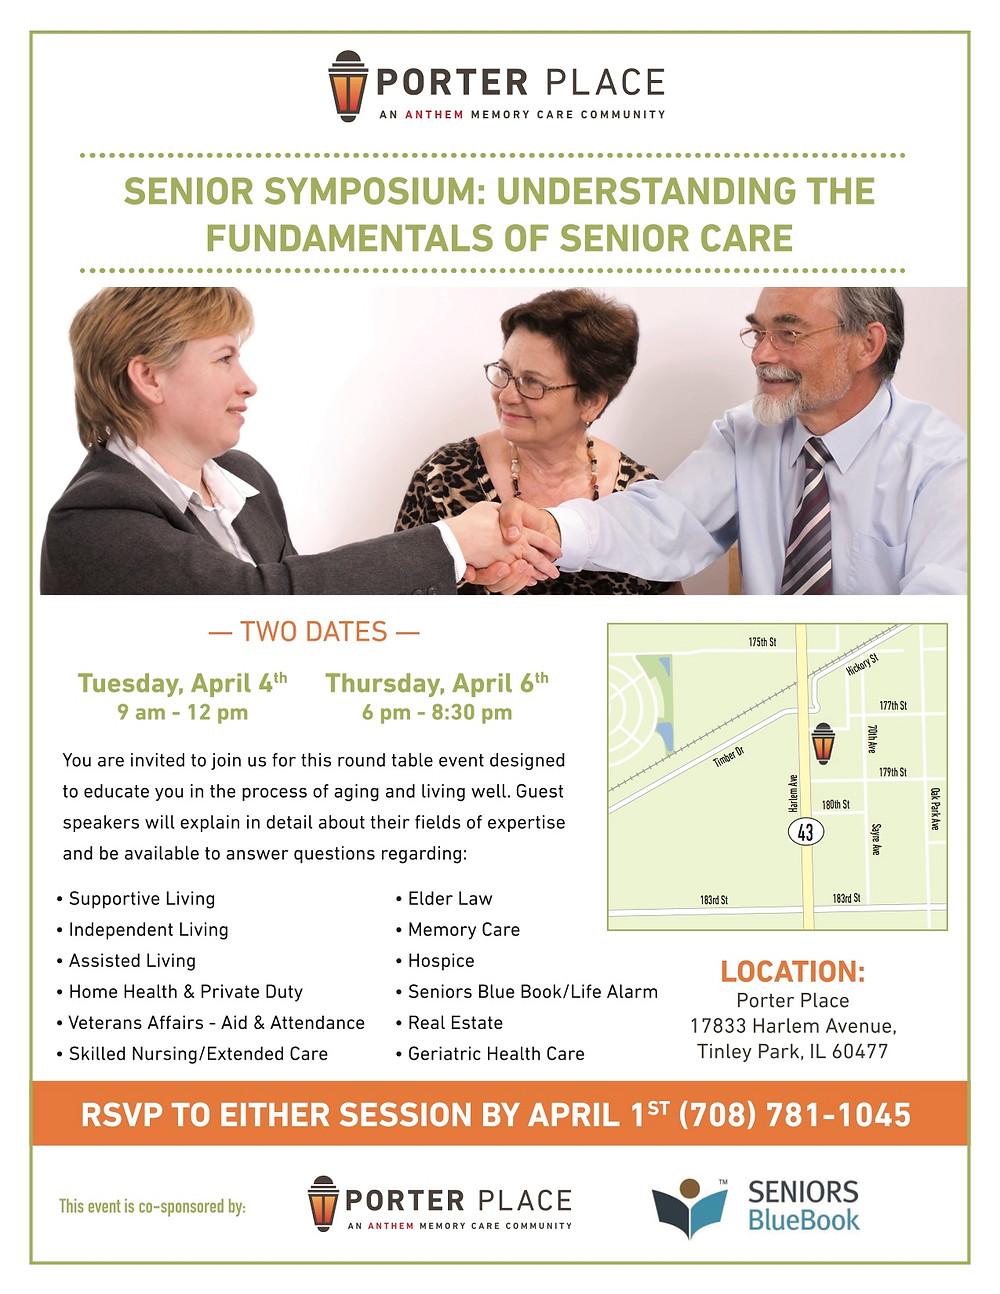 Senior Symposium Event: Understanding the Fundamentals of Senior Care April 4th and 6th